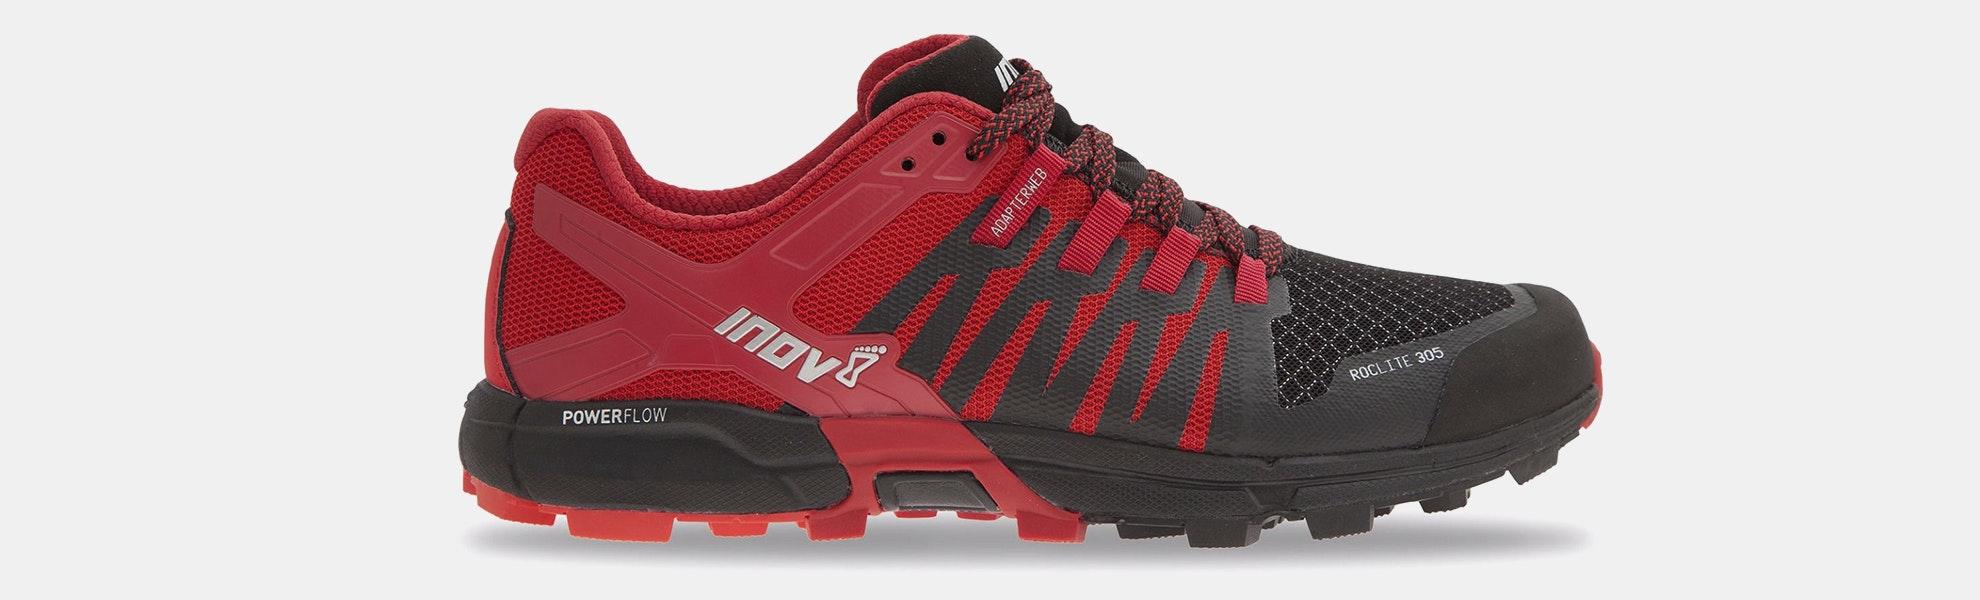 Inov-8 Roclite 305 & 305 GTX Trail Running Shoe